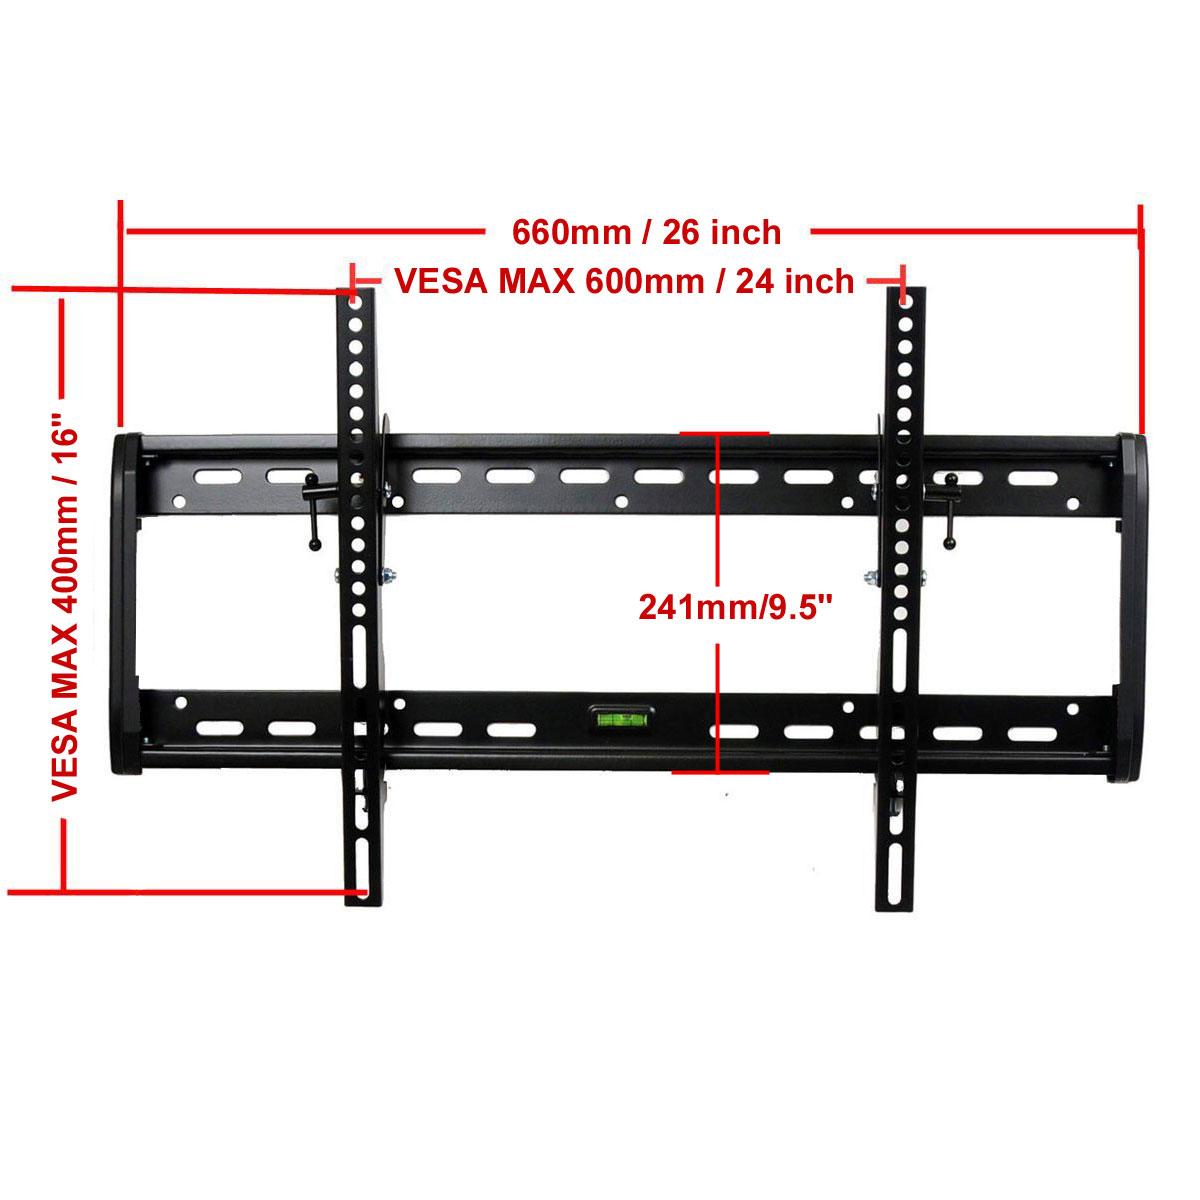 "VideoSecu Tilt TV Wall Mount for Samsung 32 37 39 40 46 50 51 55 60 64 65 75"" LED LCD Plasma Flat Panel Screen 1QH 1"